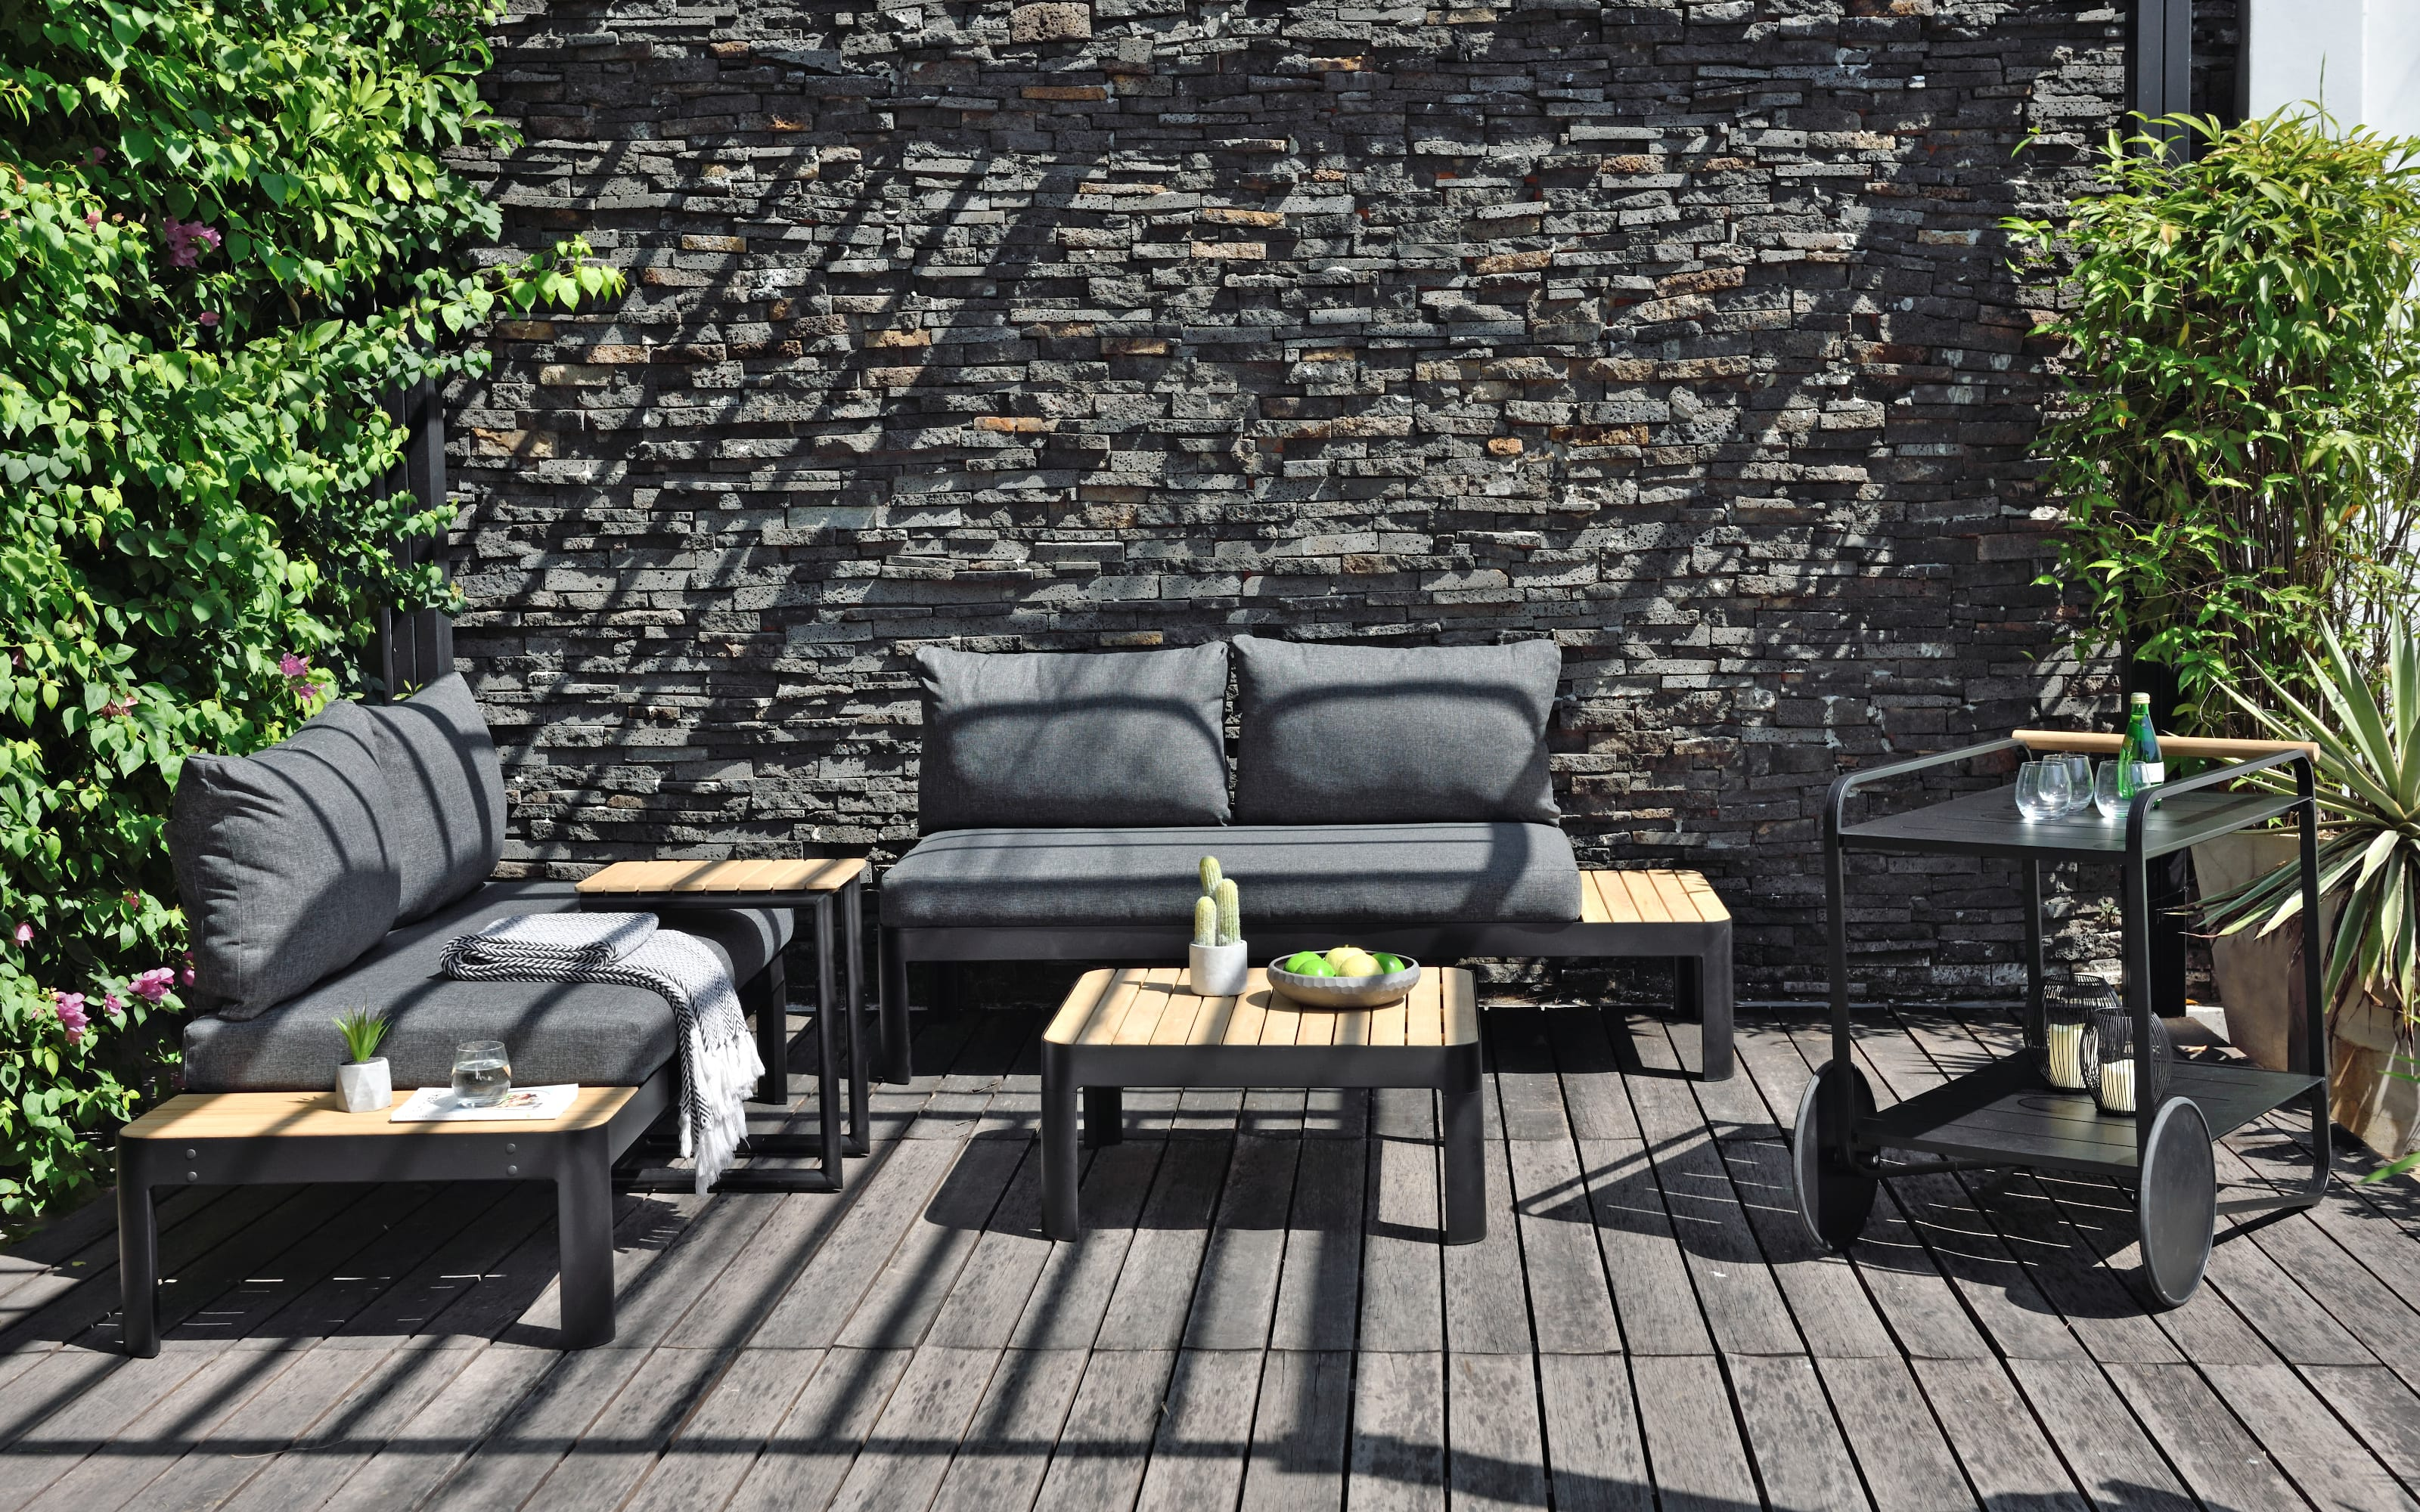 Garten-Sofa Portals in Batman black